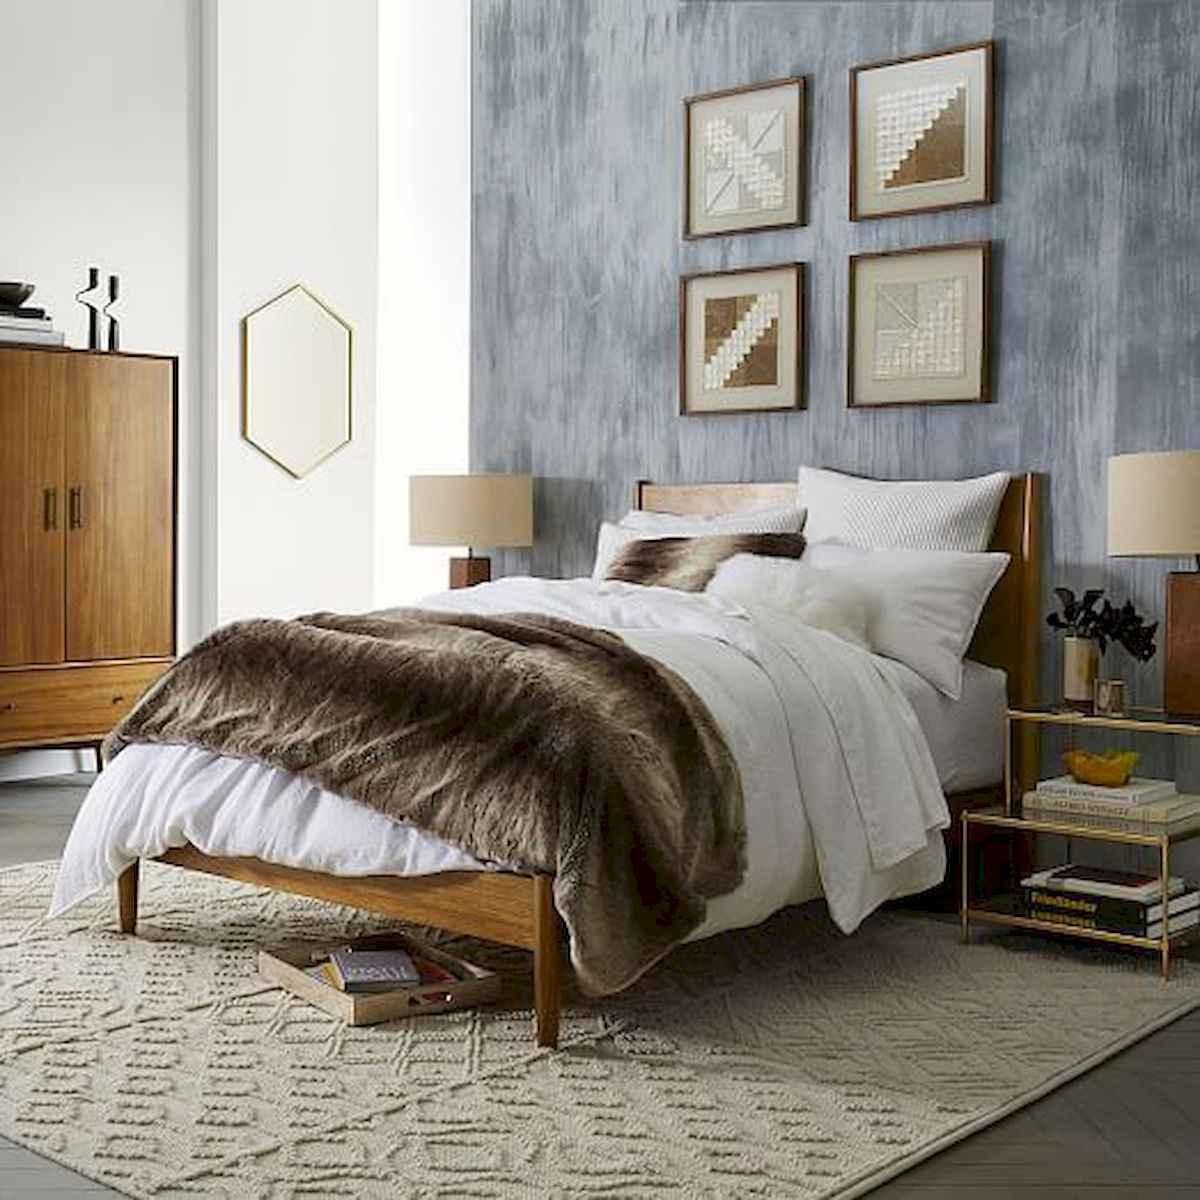 120 Awesome Farmhouse Master Bedroom Decor Ideas (13)